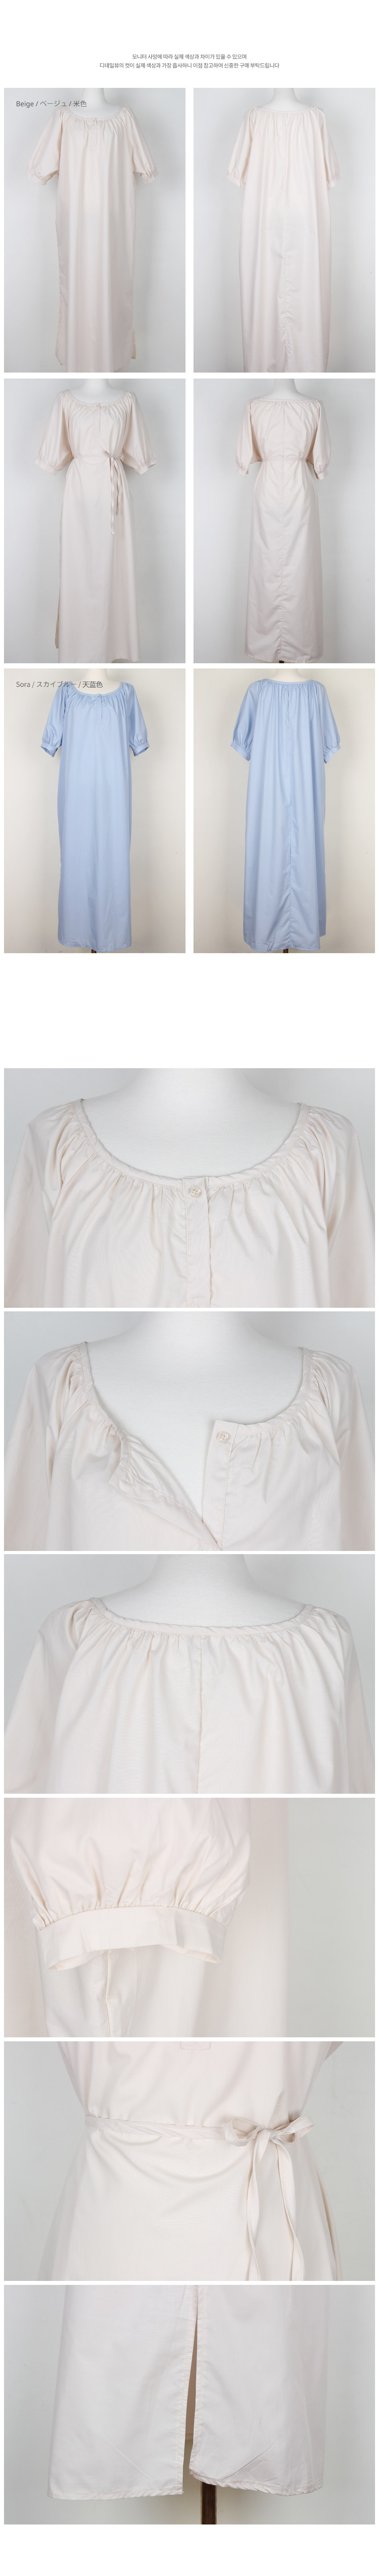 Erin string dress _H